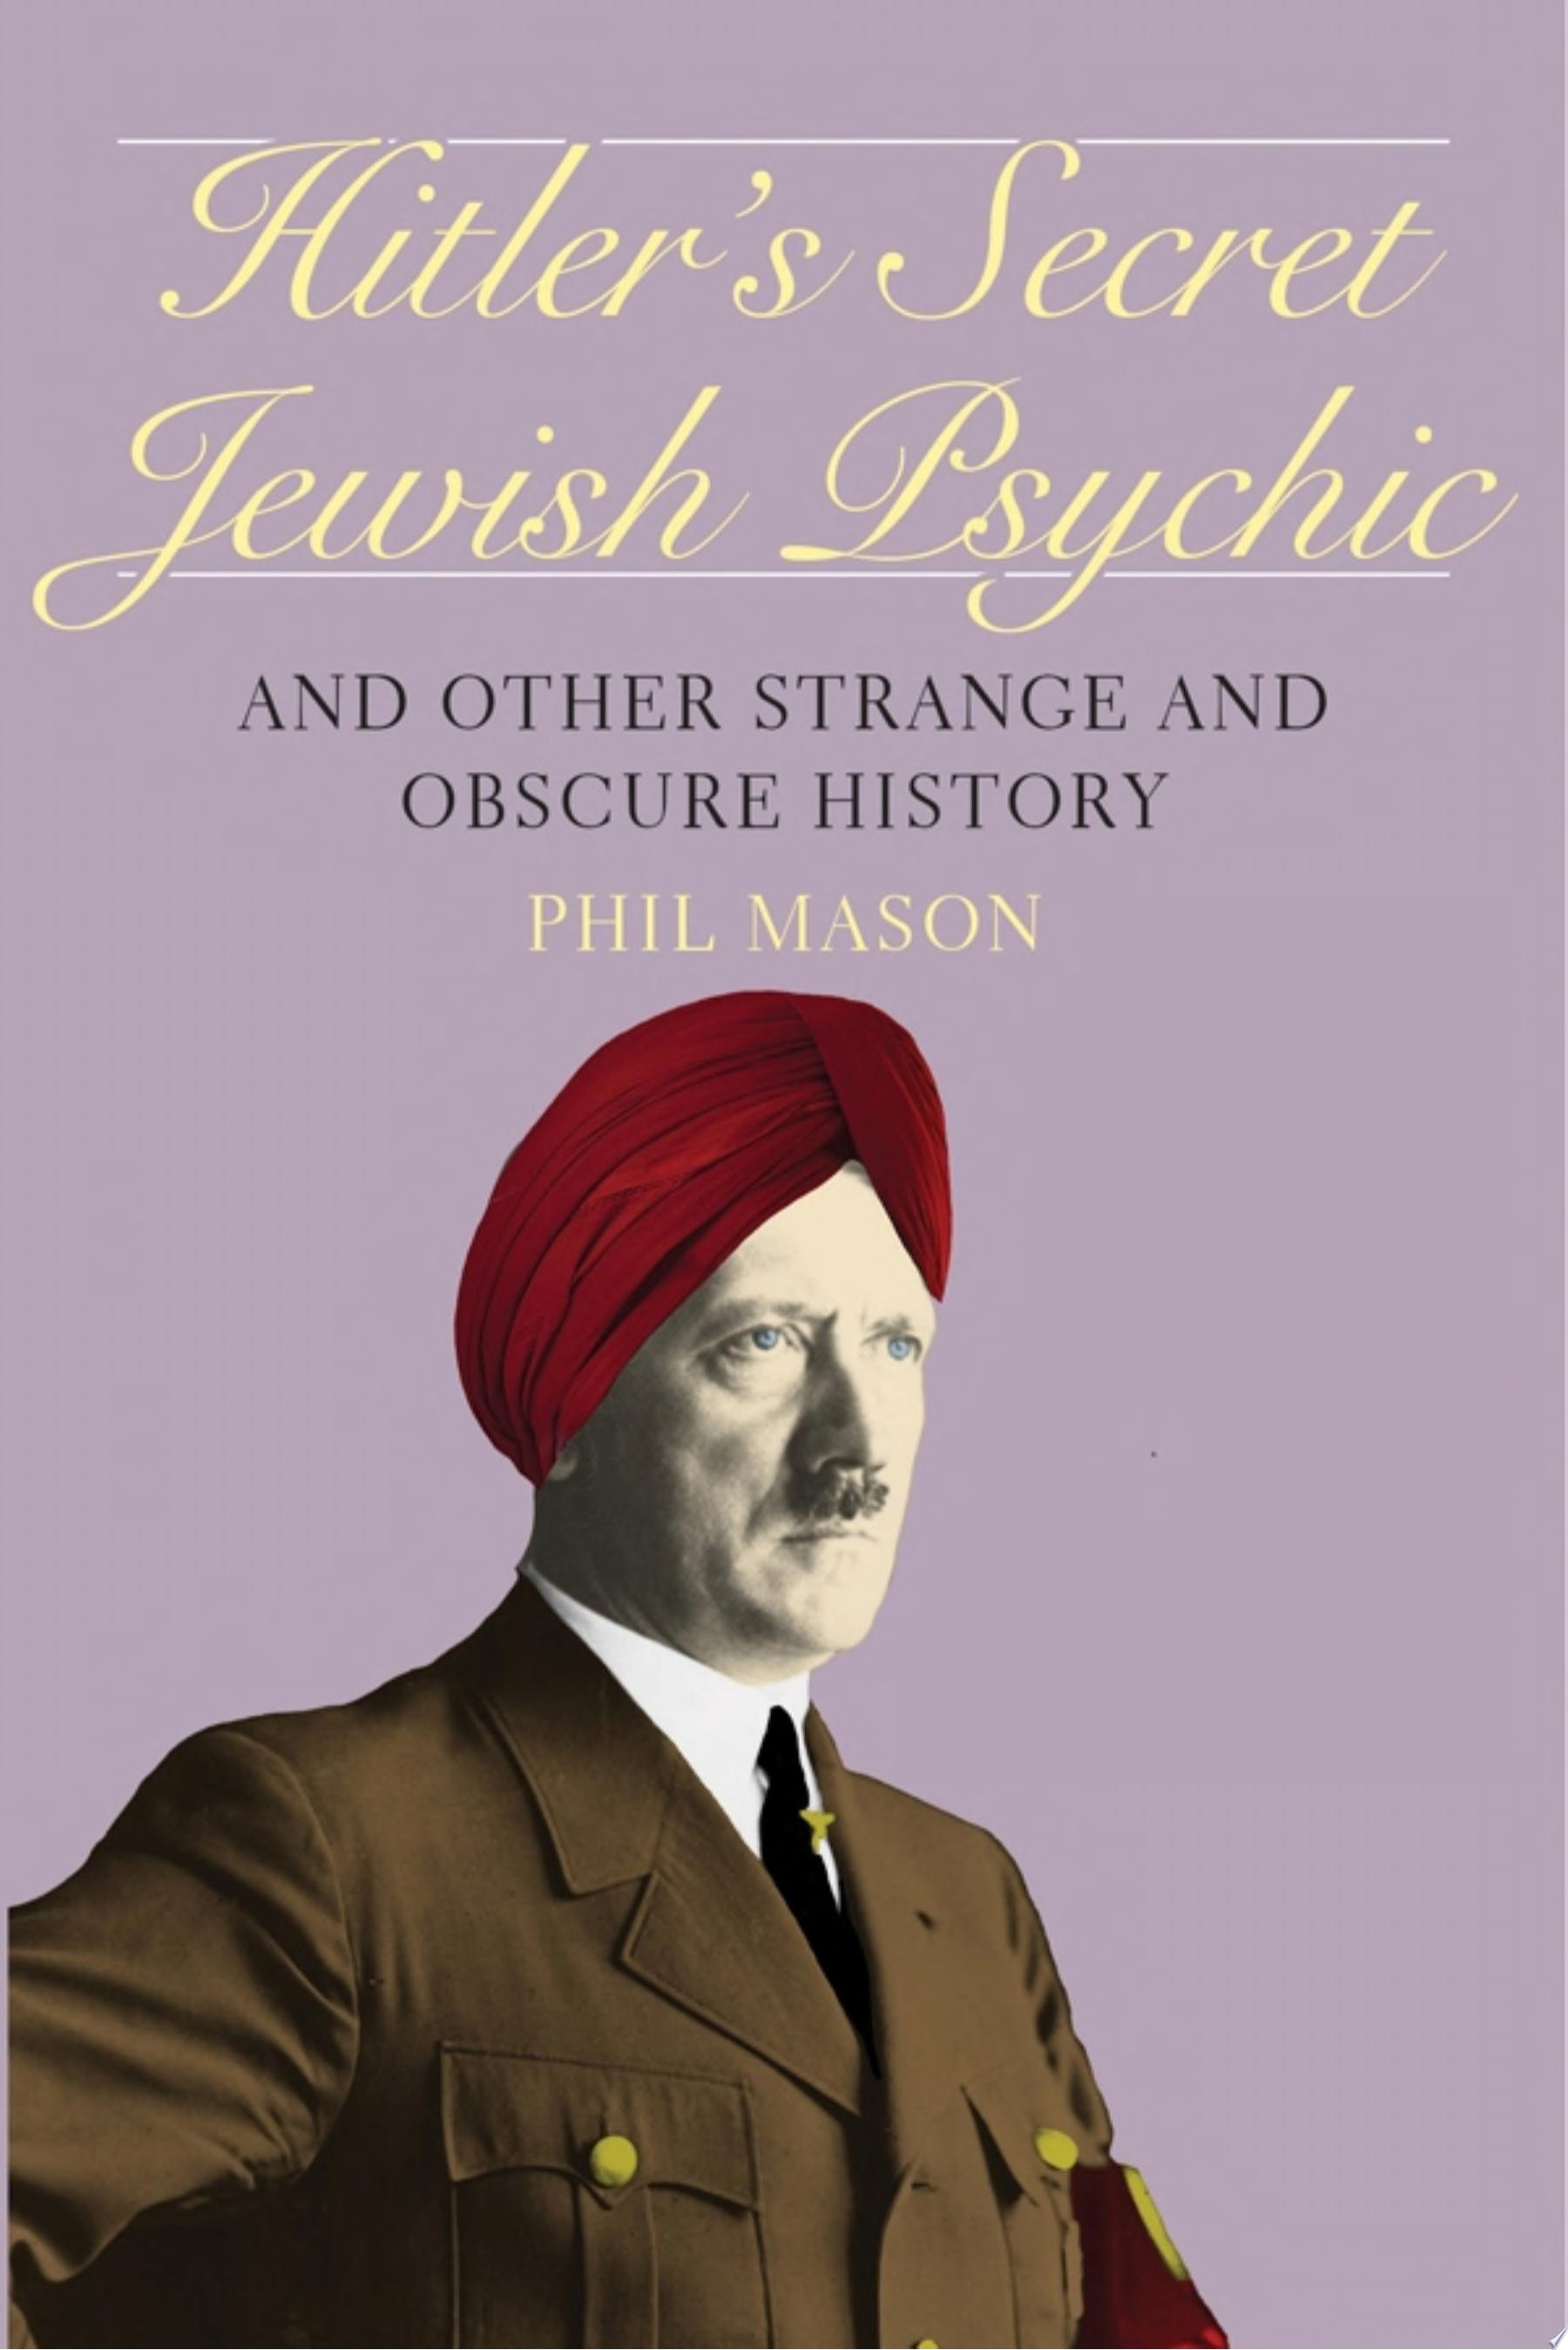 Hitler s Secret Jewish Psychic